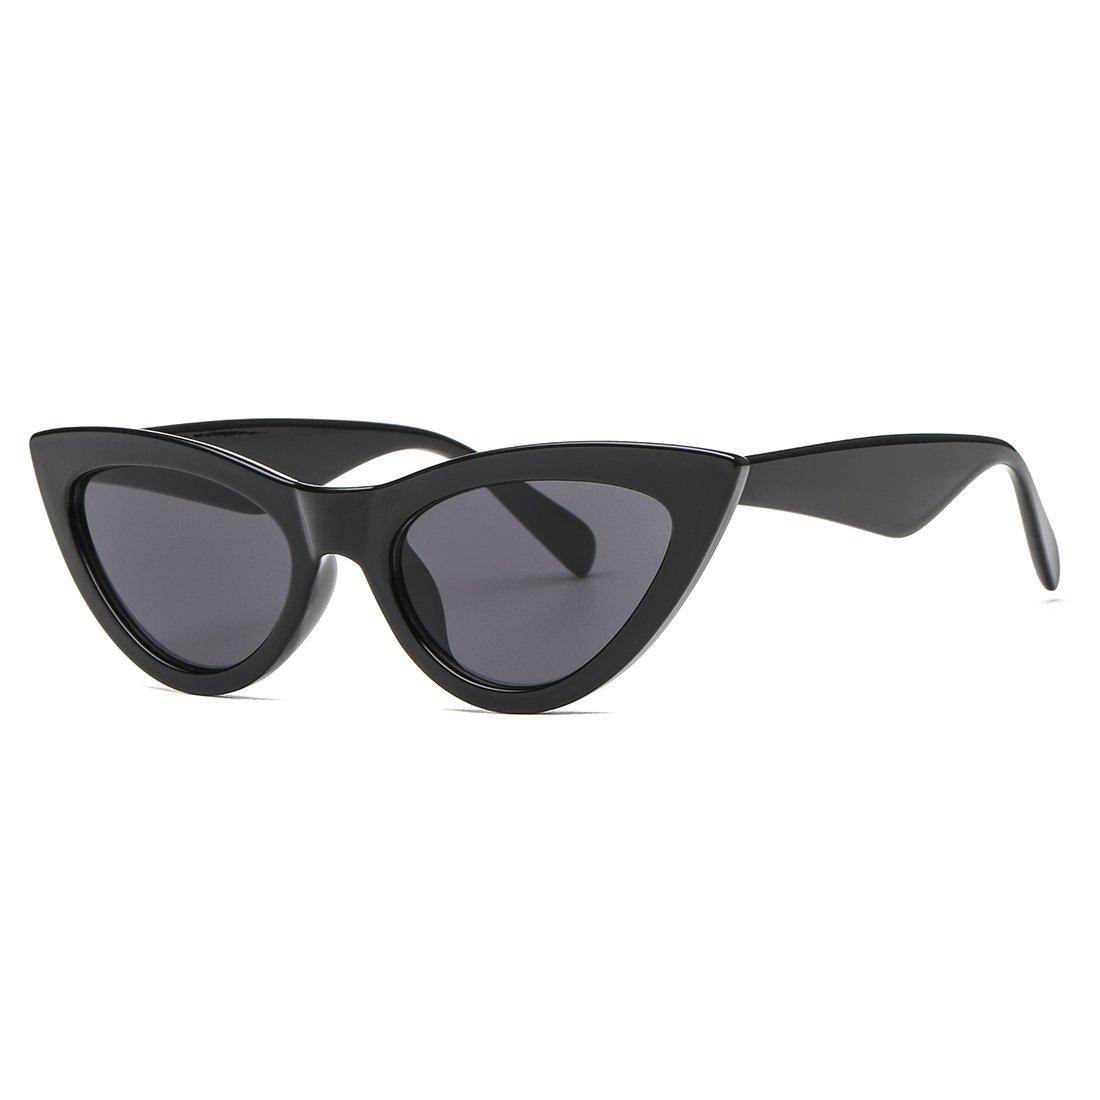 8f48e7740fb Amazon.com  AEVOGUE Womens Sunglasses Cat Eye Vintage Mirrored Lens Plastic  Frame UV400 (Black